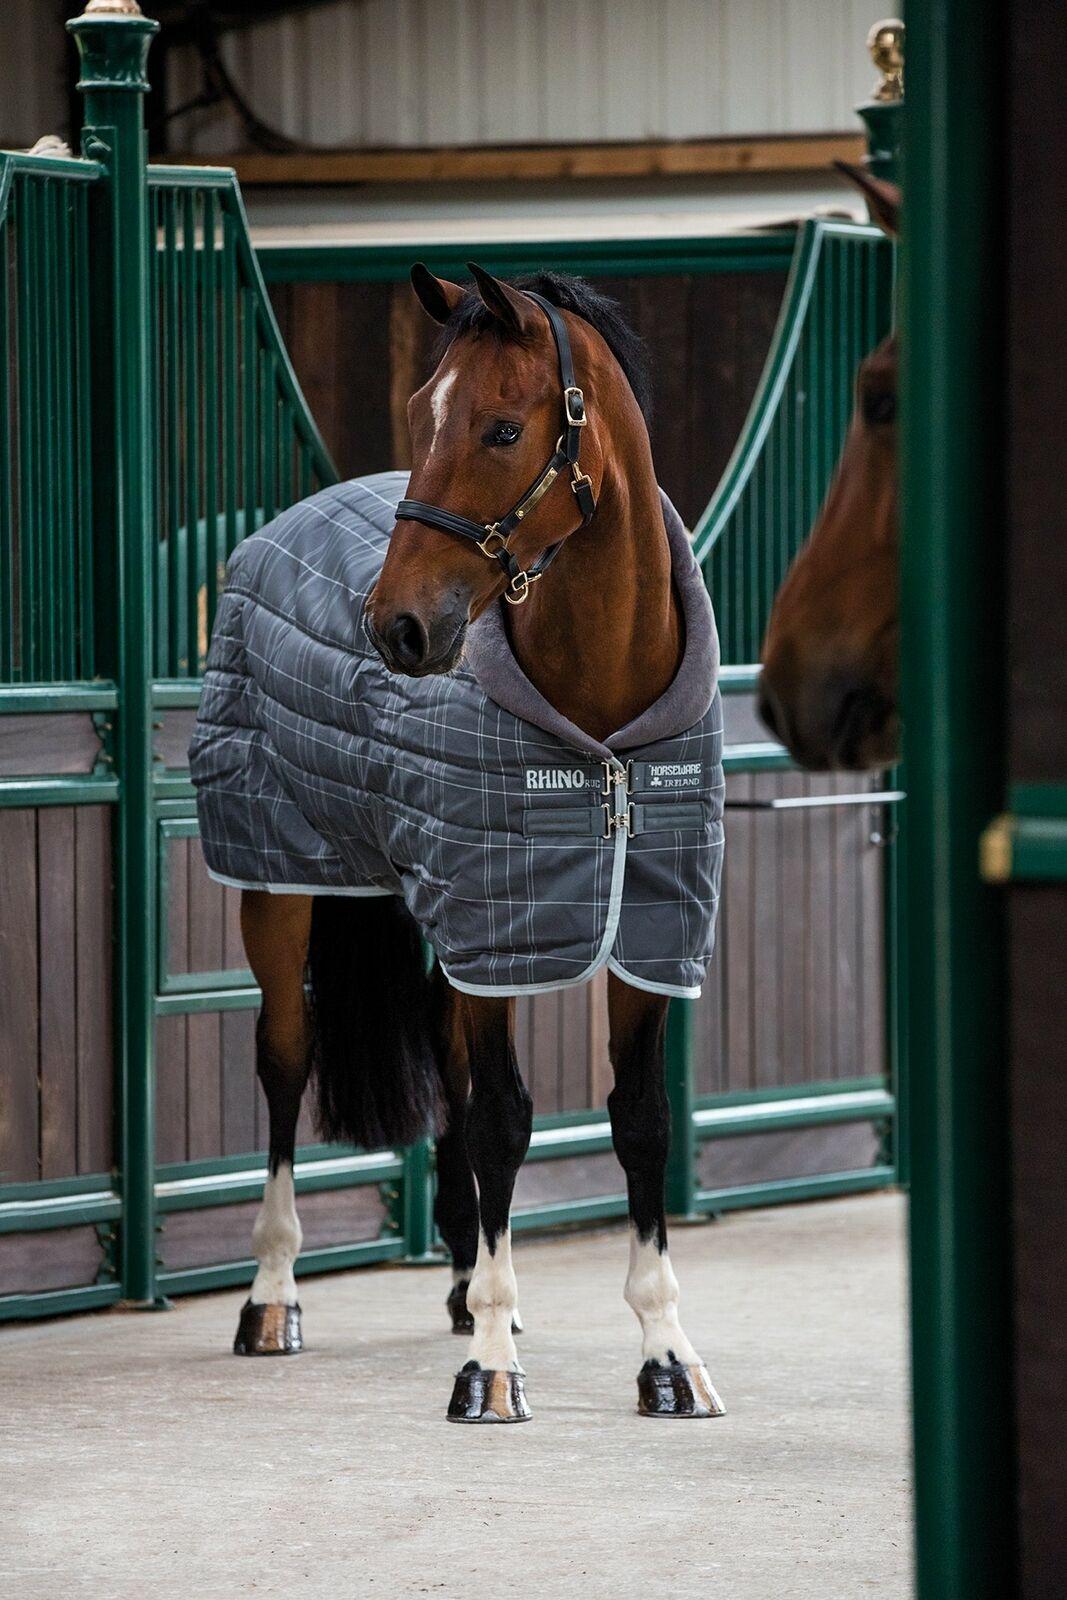 Horseware Rhino Original Stable Blanket with VariLayer  Heavy 450G